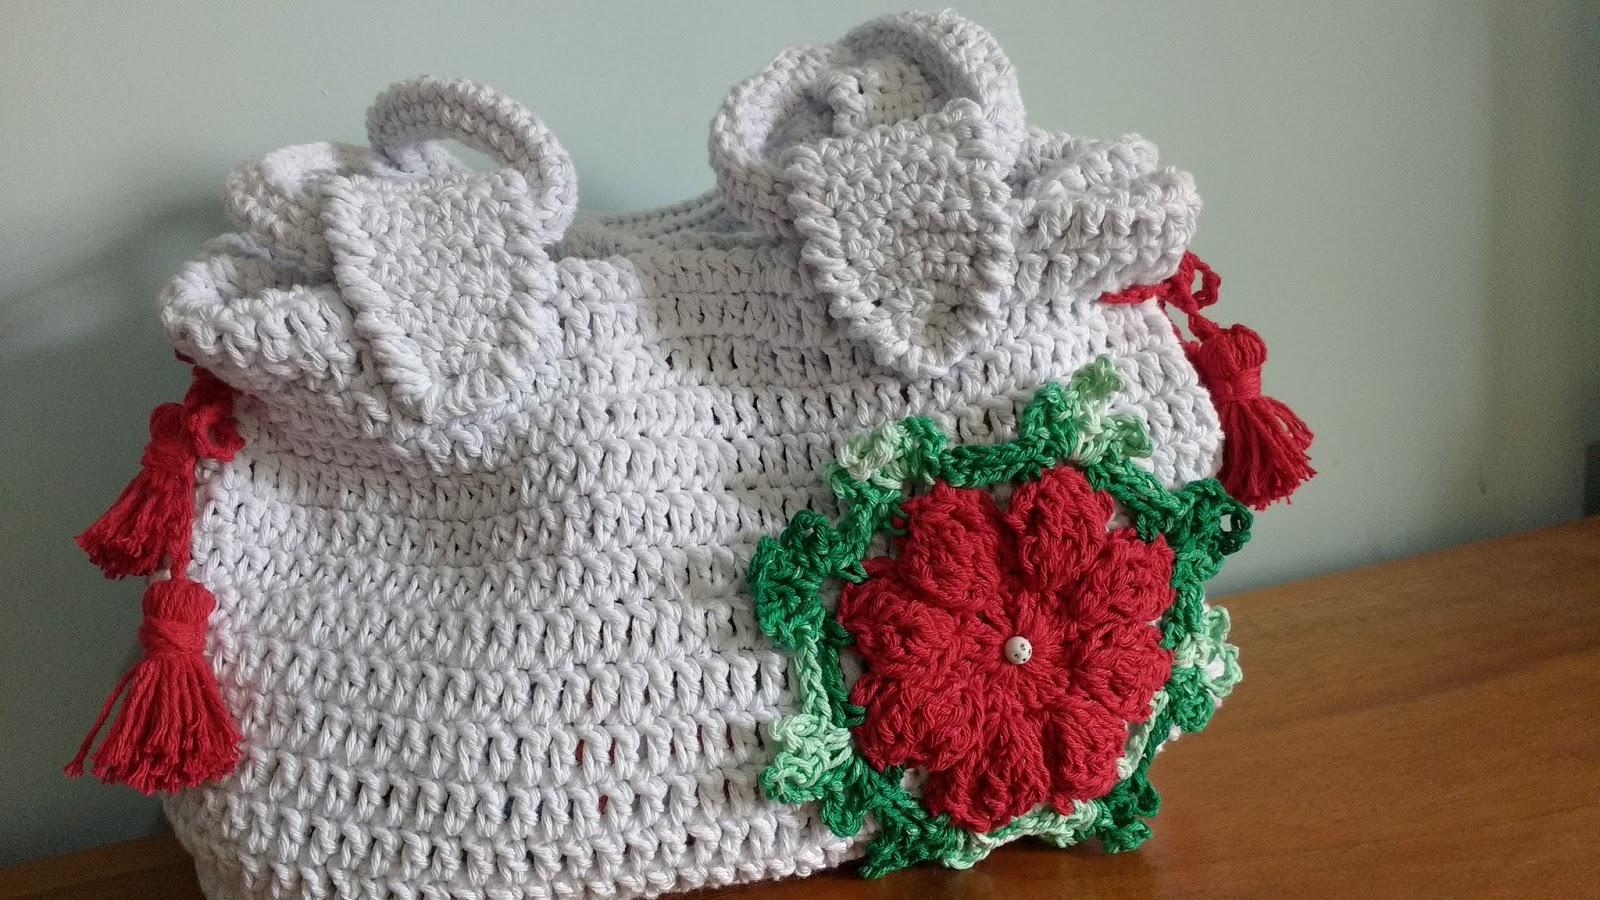 Bolsa De Croche Para Casamento : Croch? chique bolsa croch?